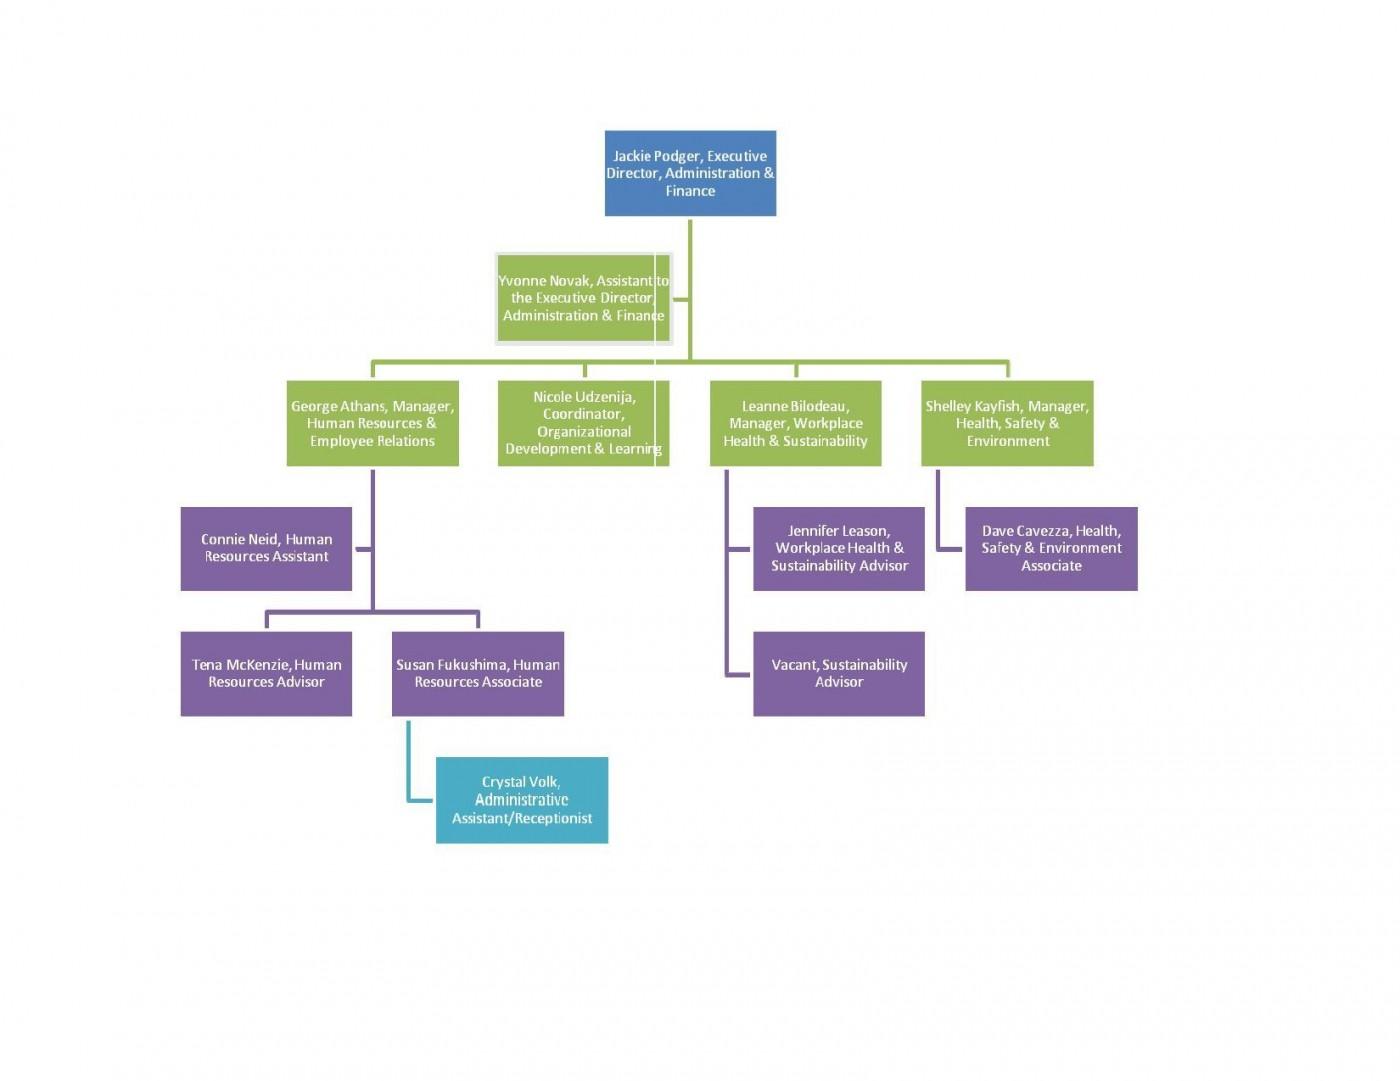 000 Beautiful Organization Chart Template Word 2013 Highest Clarity  Organizational Free Microsoft1400